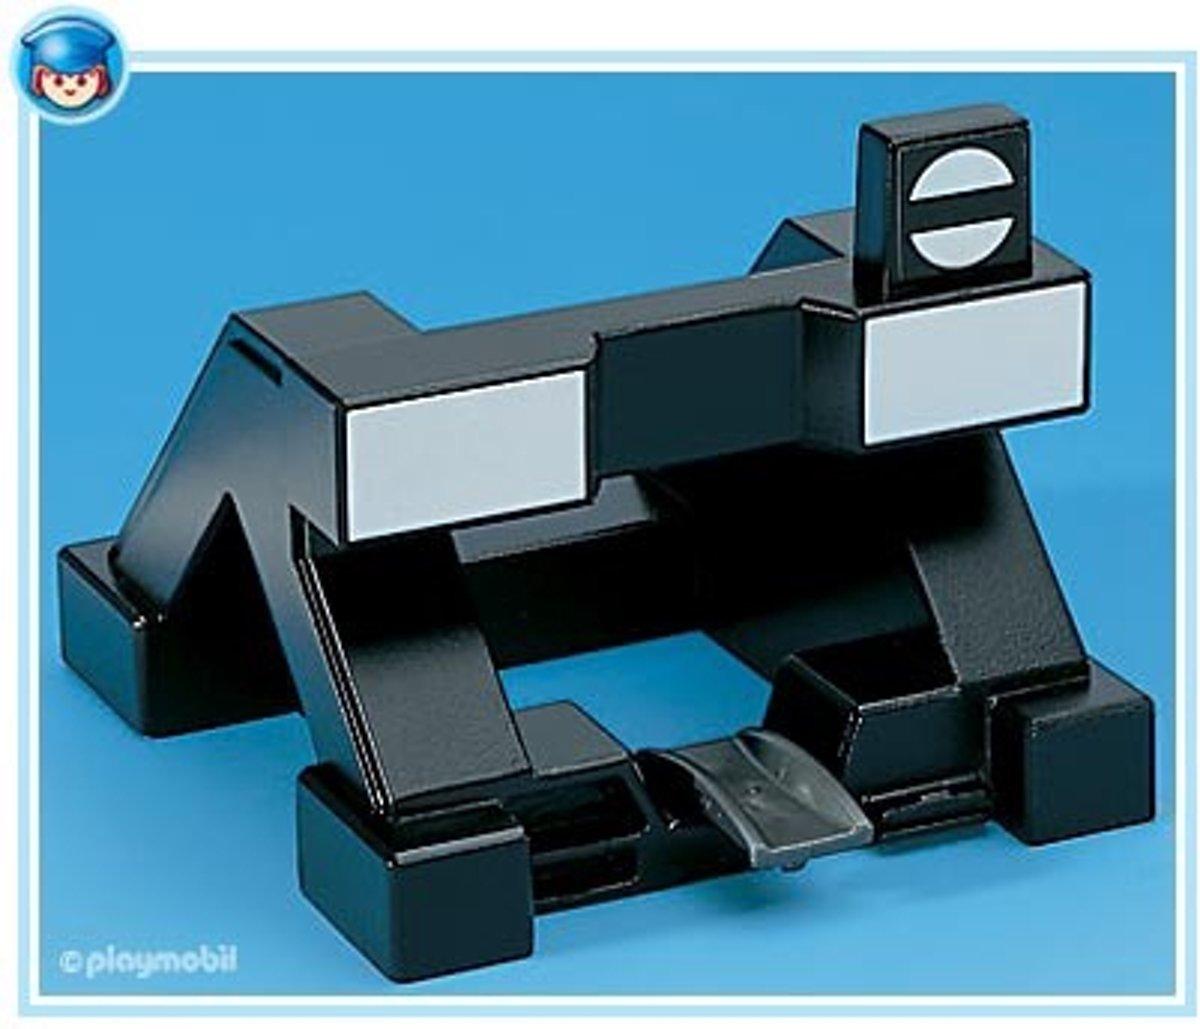 Playmobil Stootblok 4391